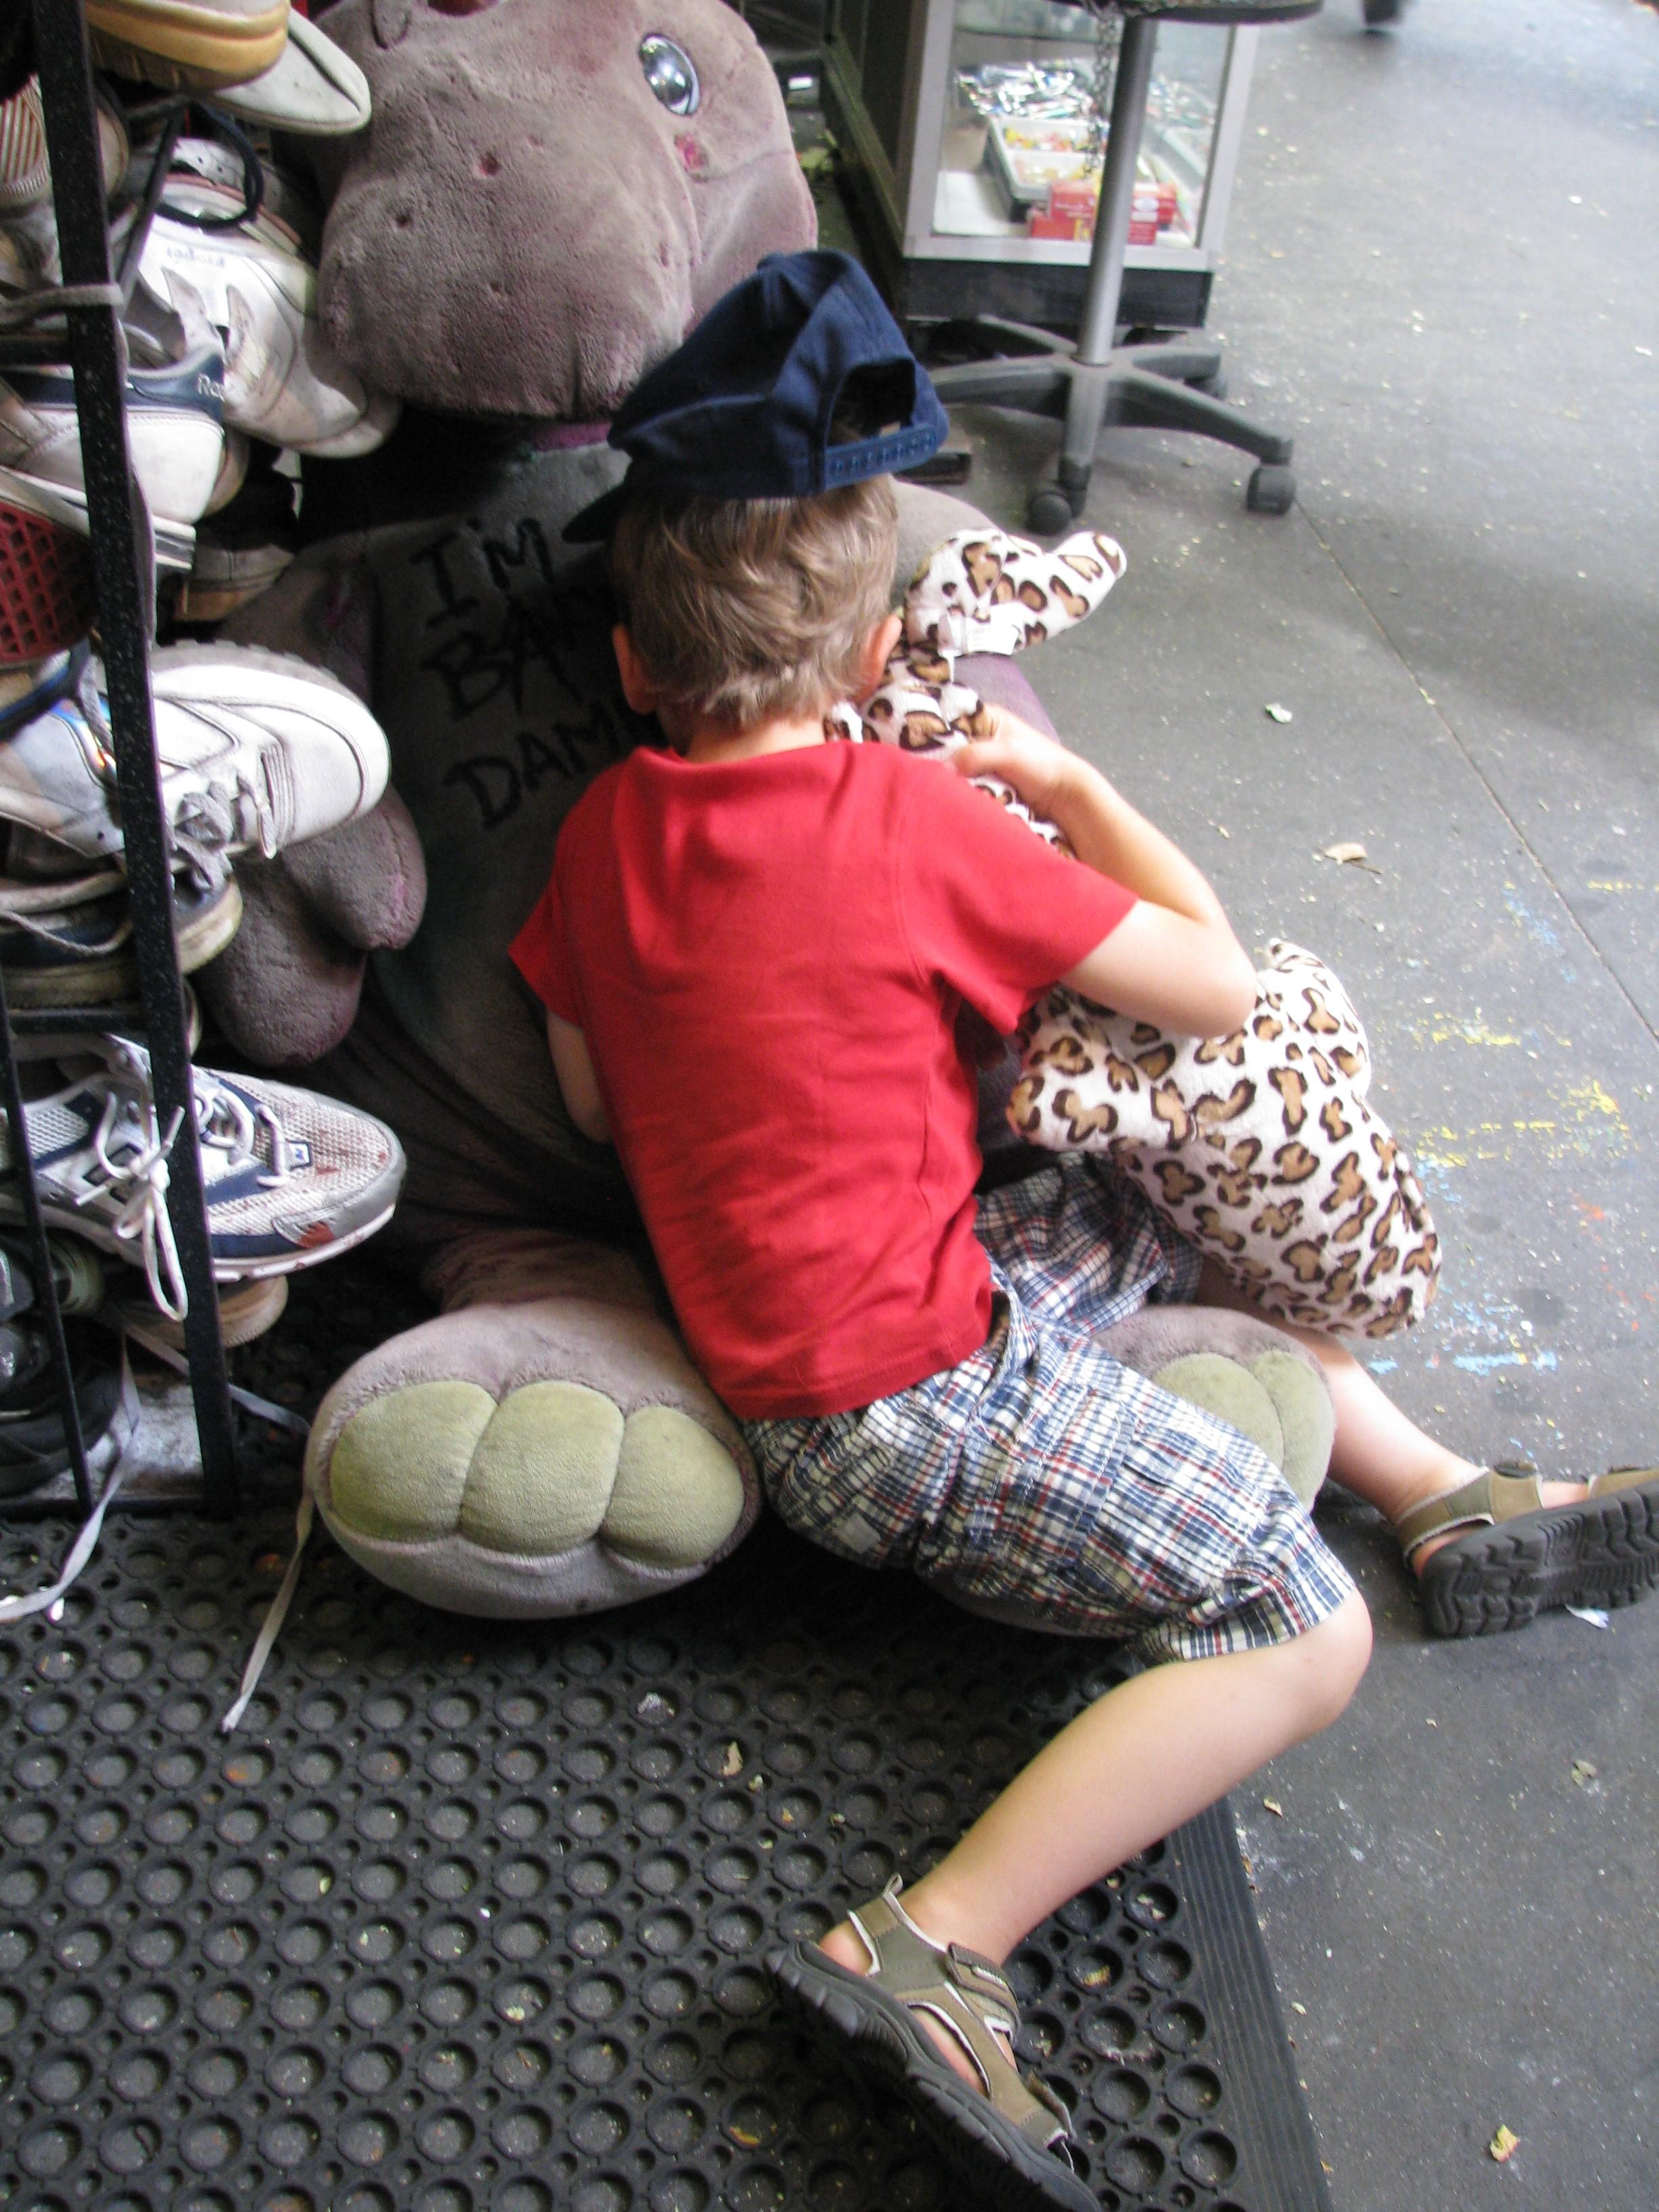 Kid hugging Barney Toy